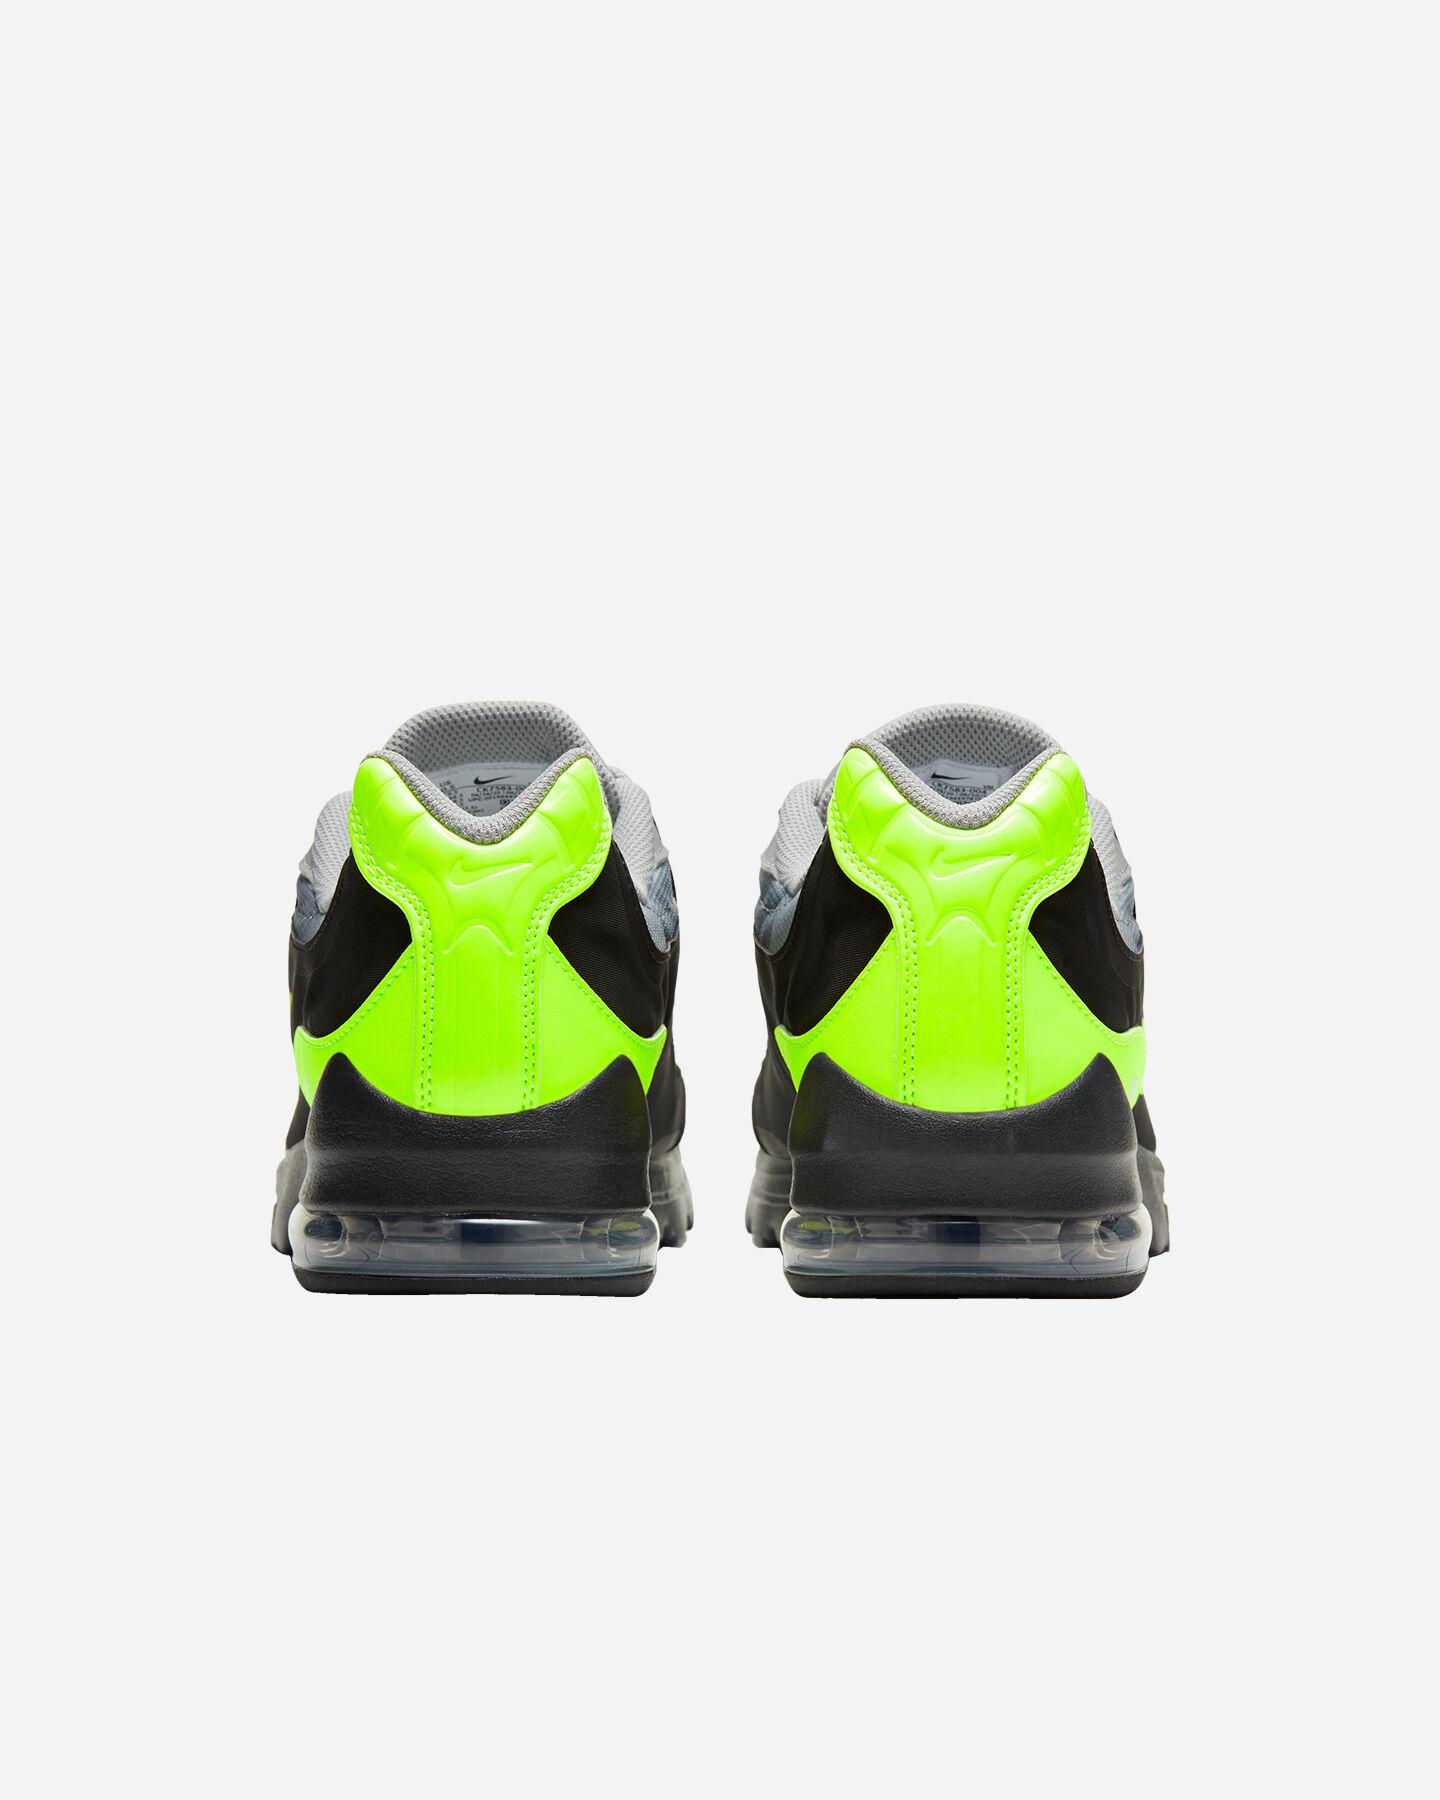 Scarpe sneakers NIKE AIR MAX VG-R M S5247961 scatto 4